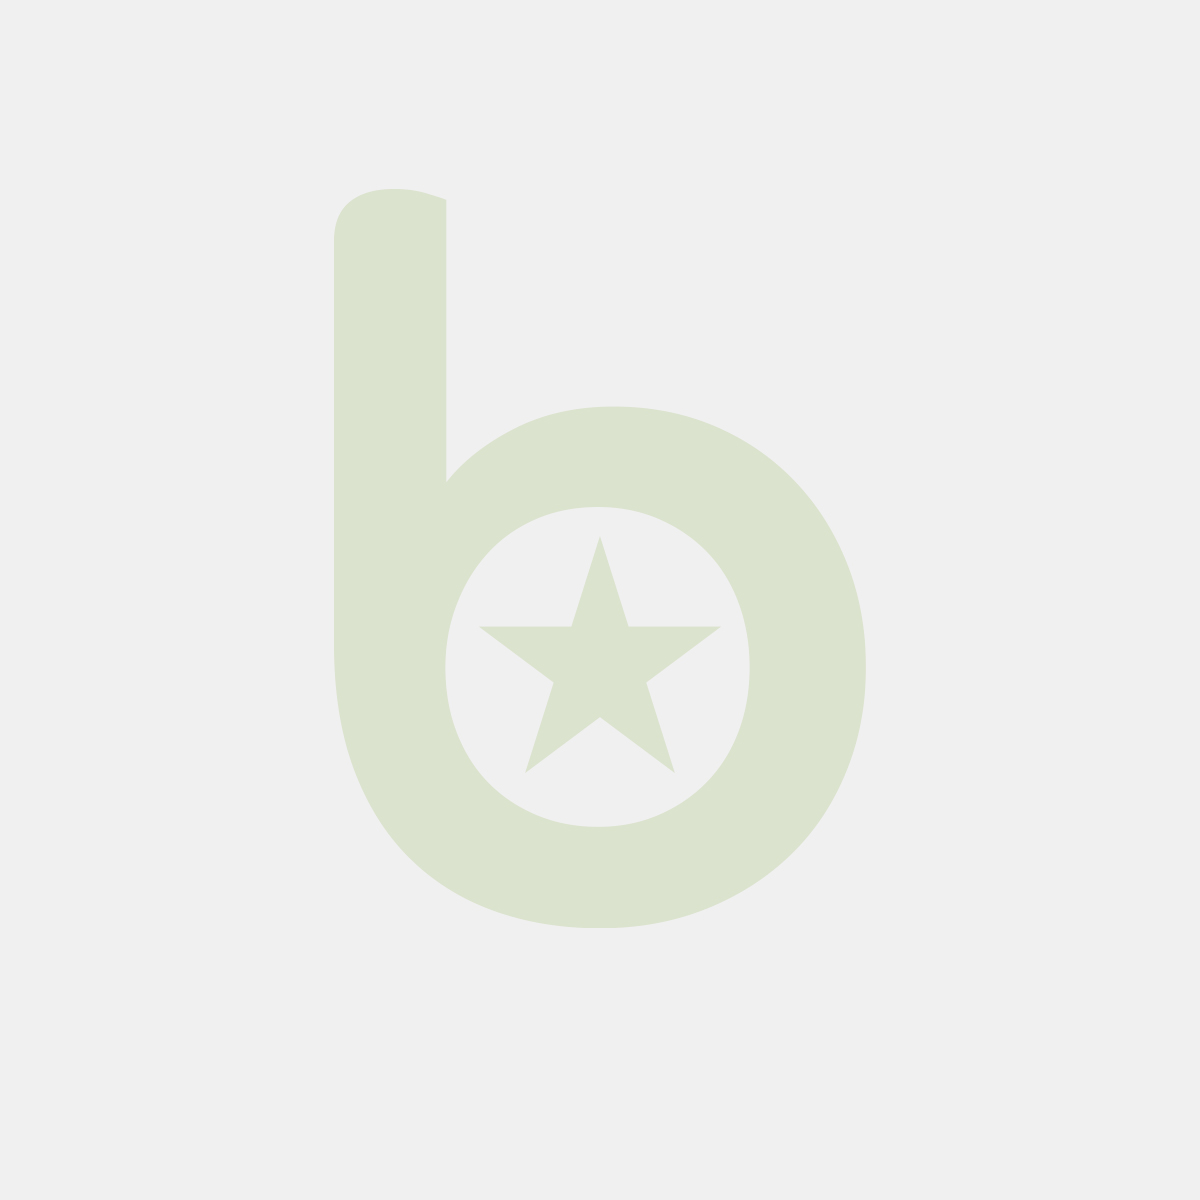 Kosz na śmieci HAN Loop I-Colour, 13l, zielony